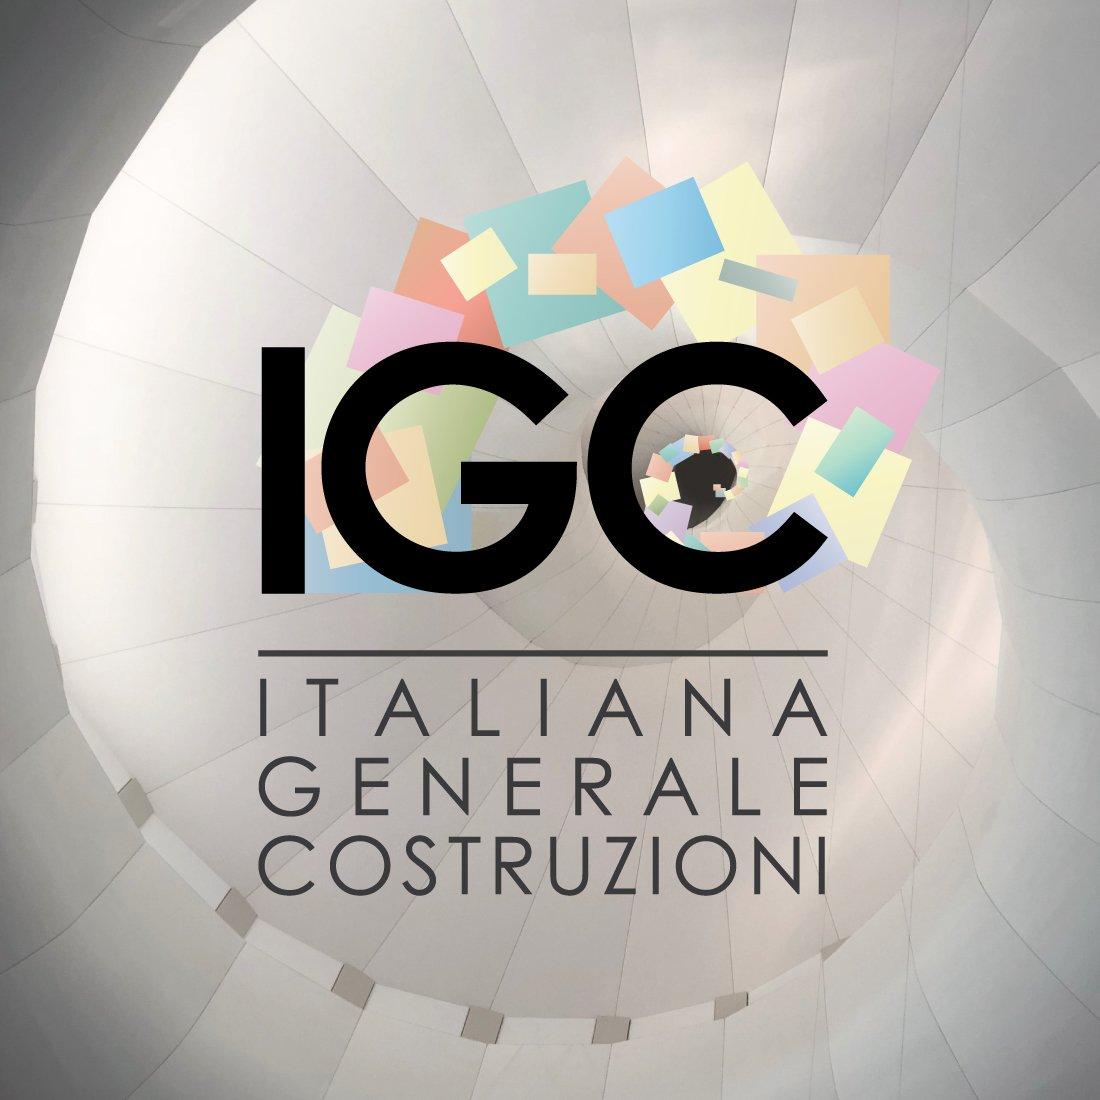 IGC COSTRUZIONI